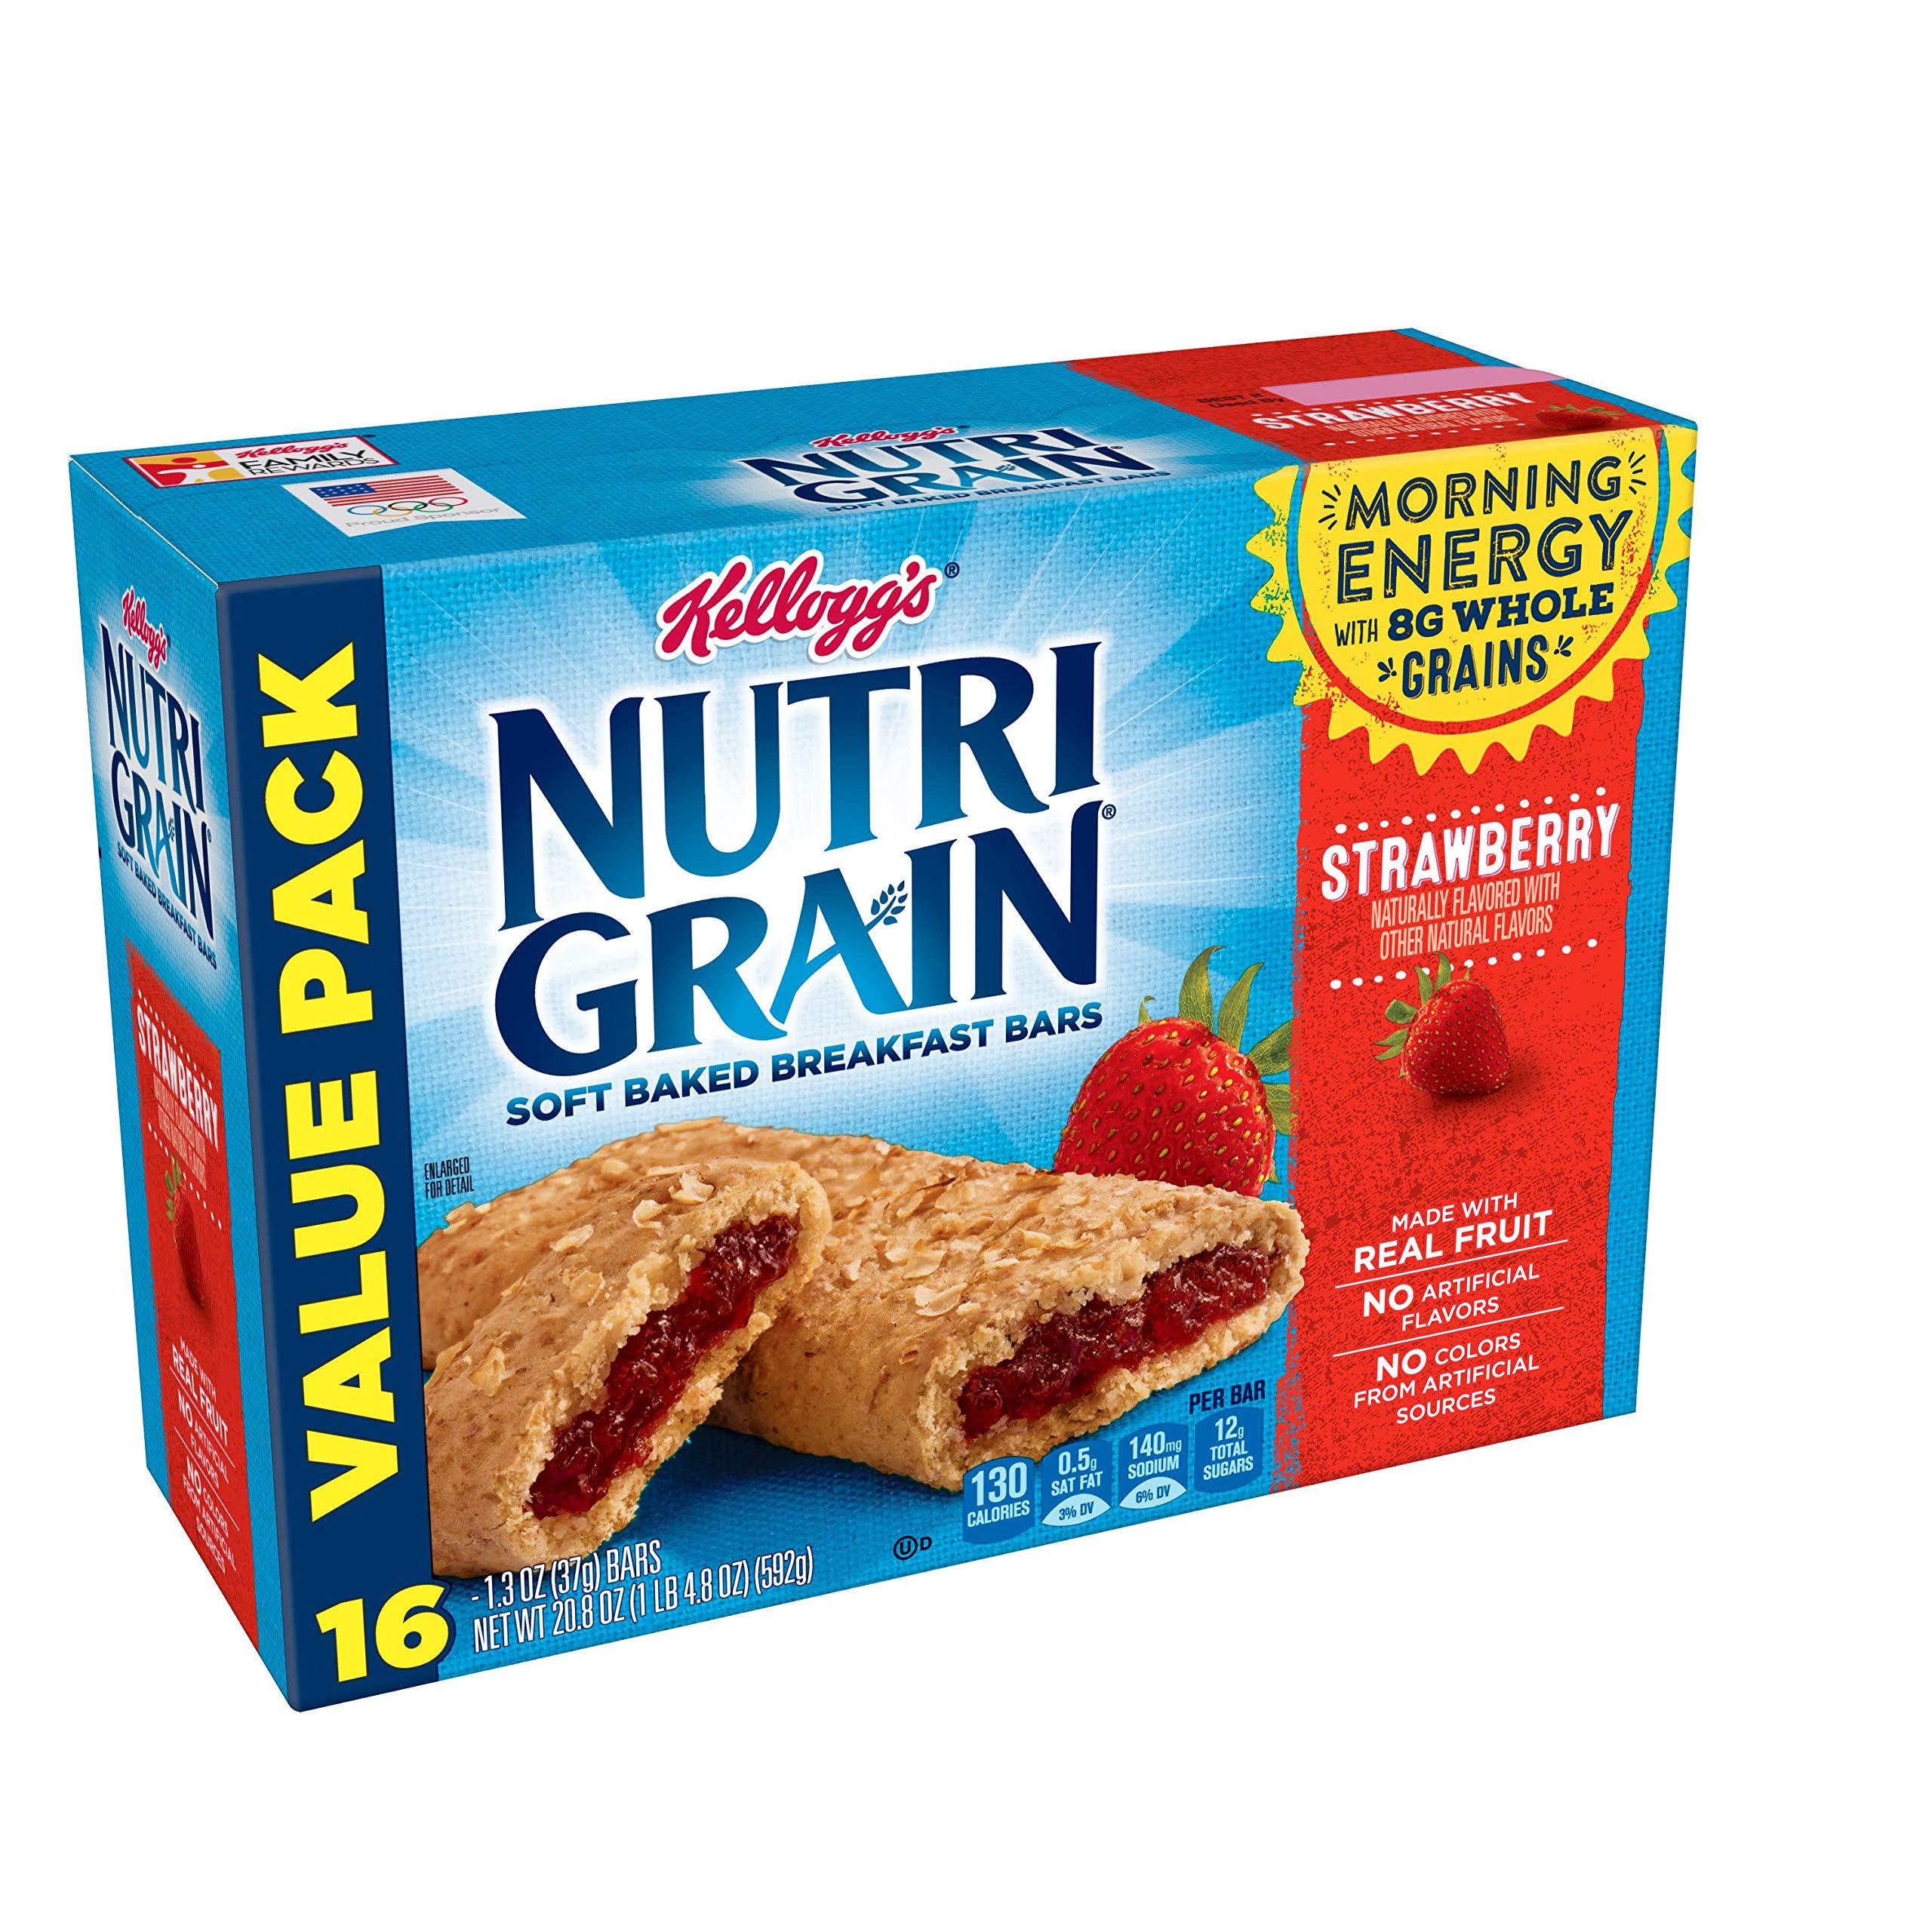 Baked Breakfast: Amazon.com: Kellogg's Nutri-Grain, Soft Baked Breakfast